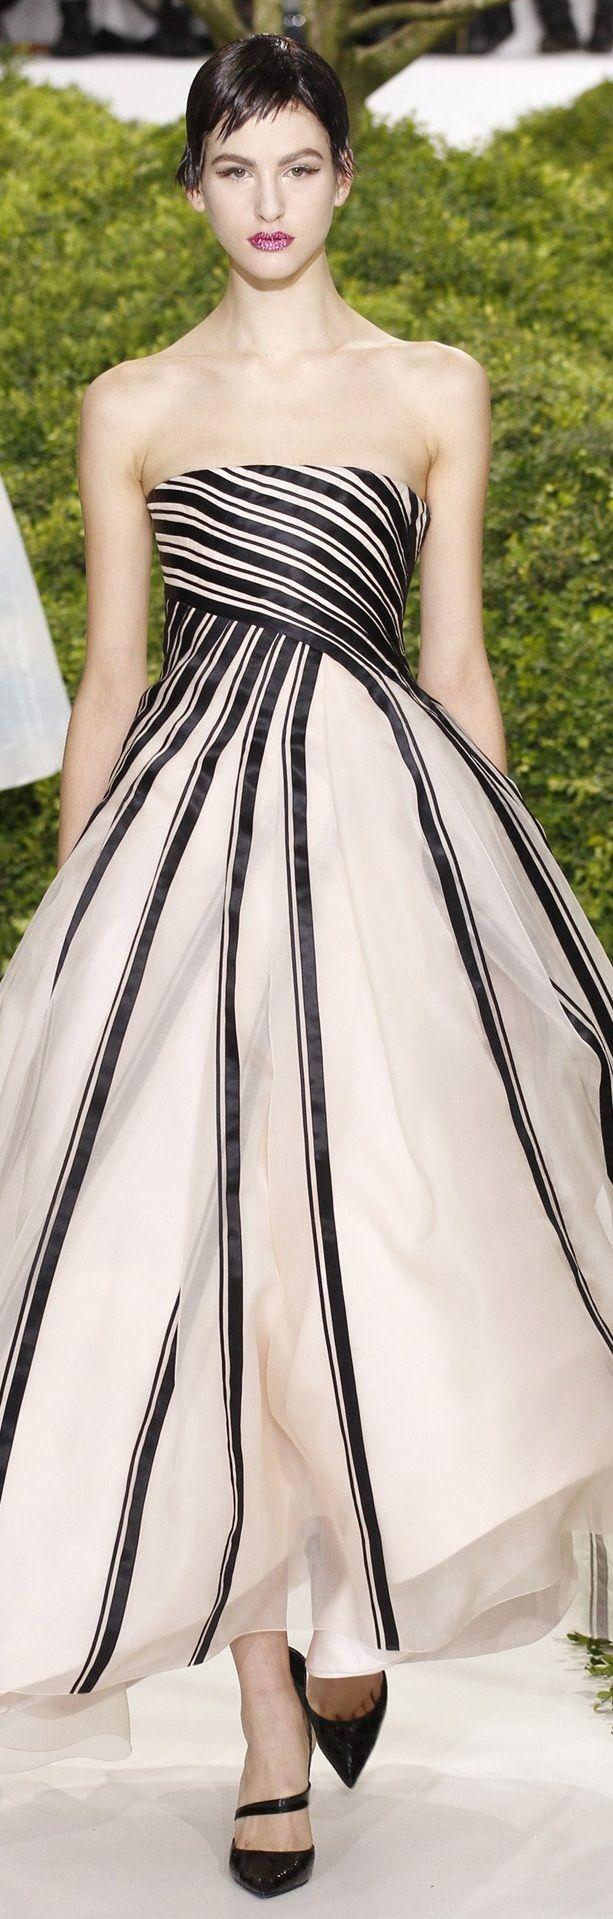 Christian Dior Haute Couture 2013 ~